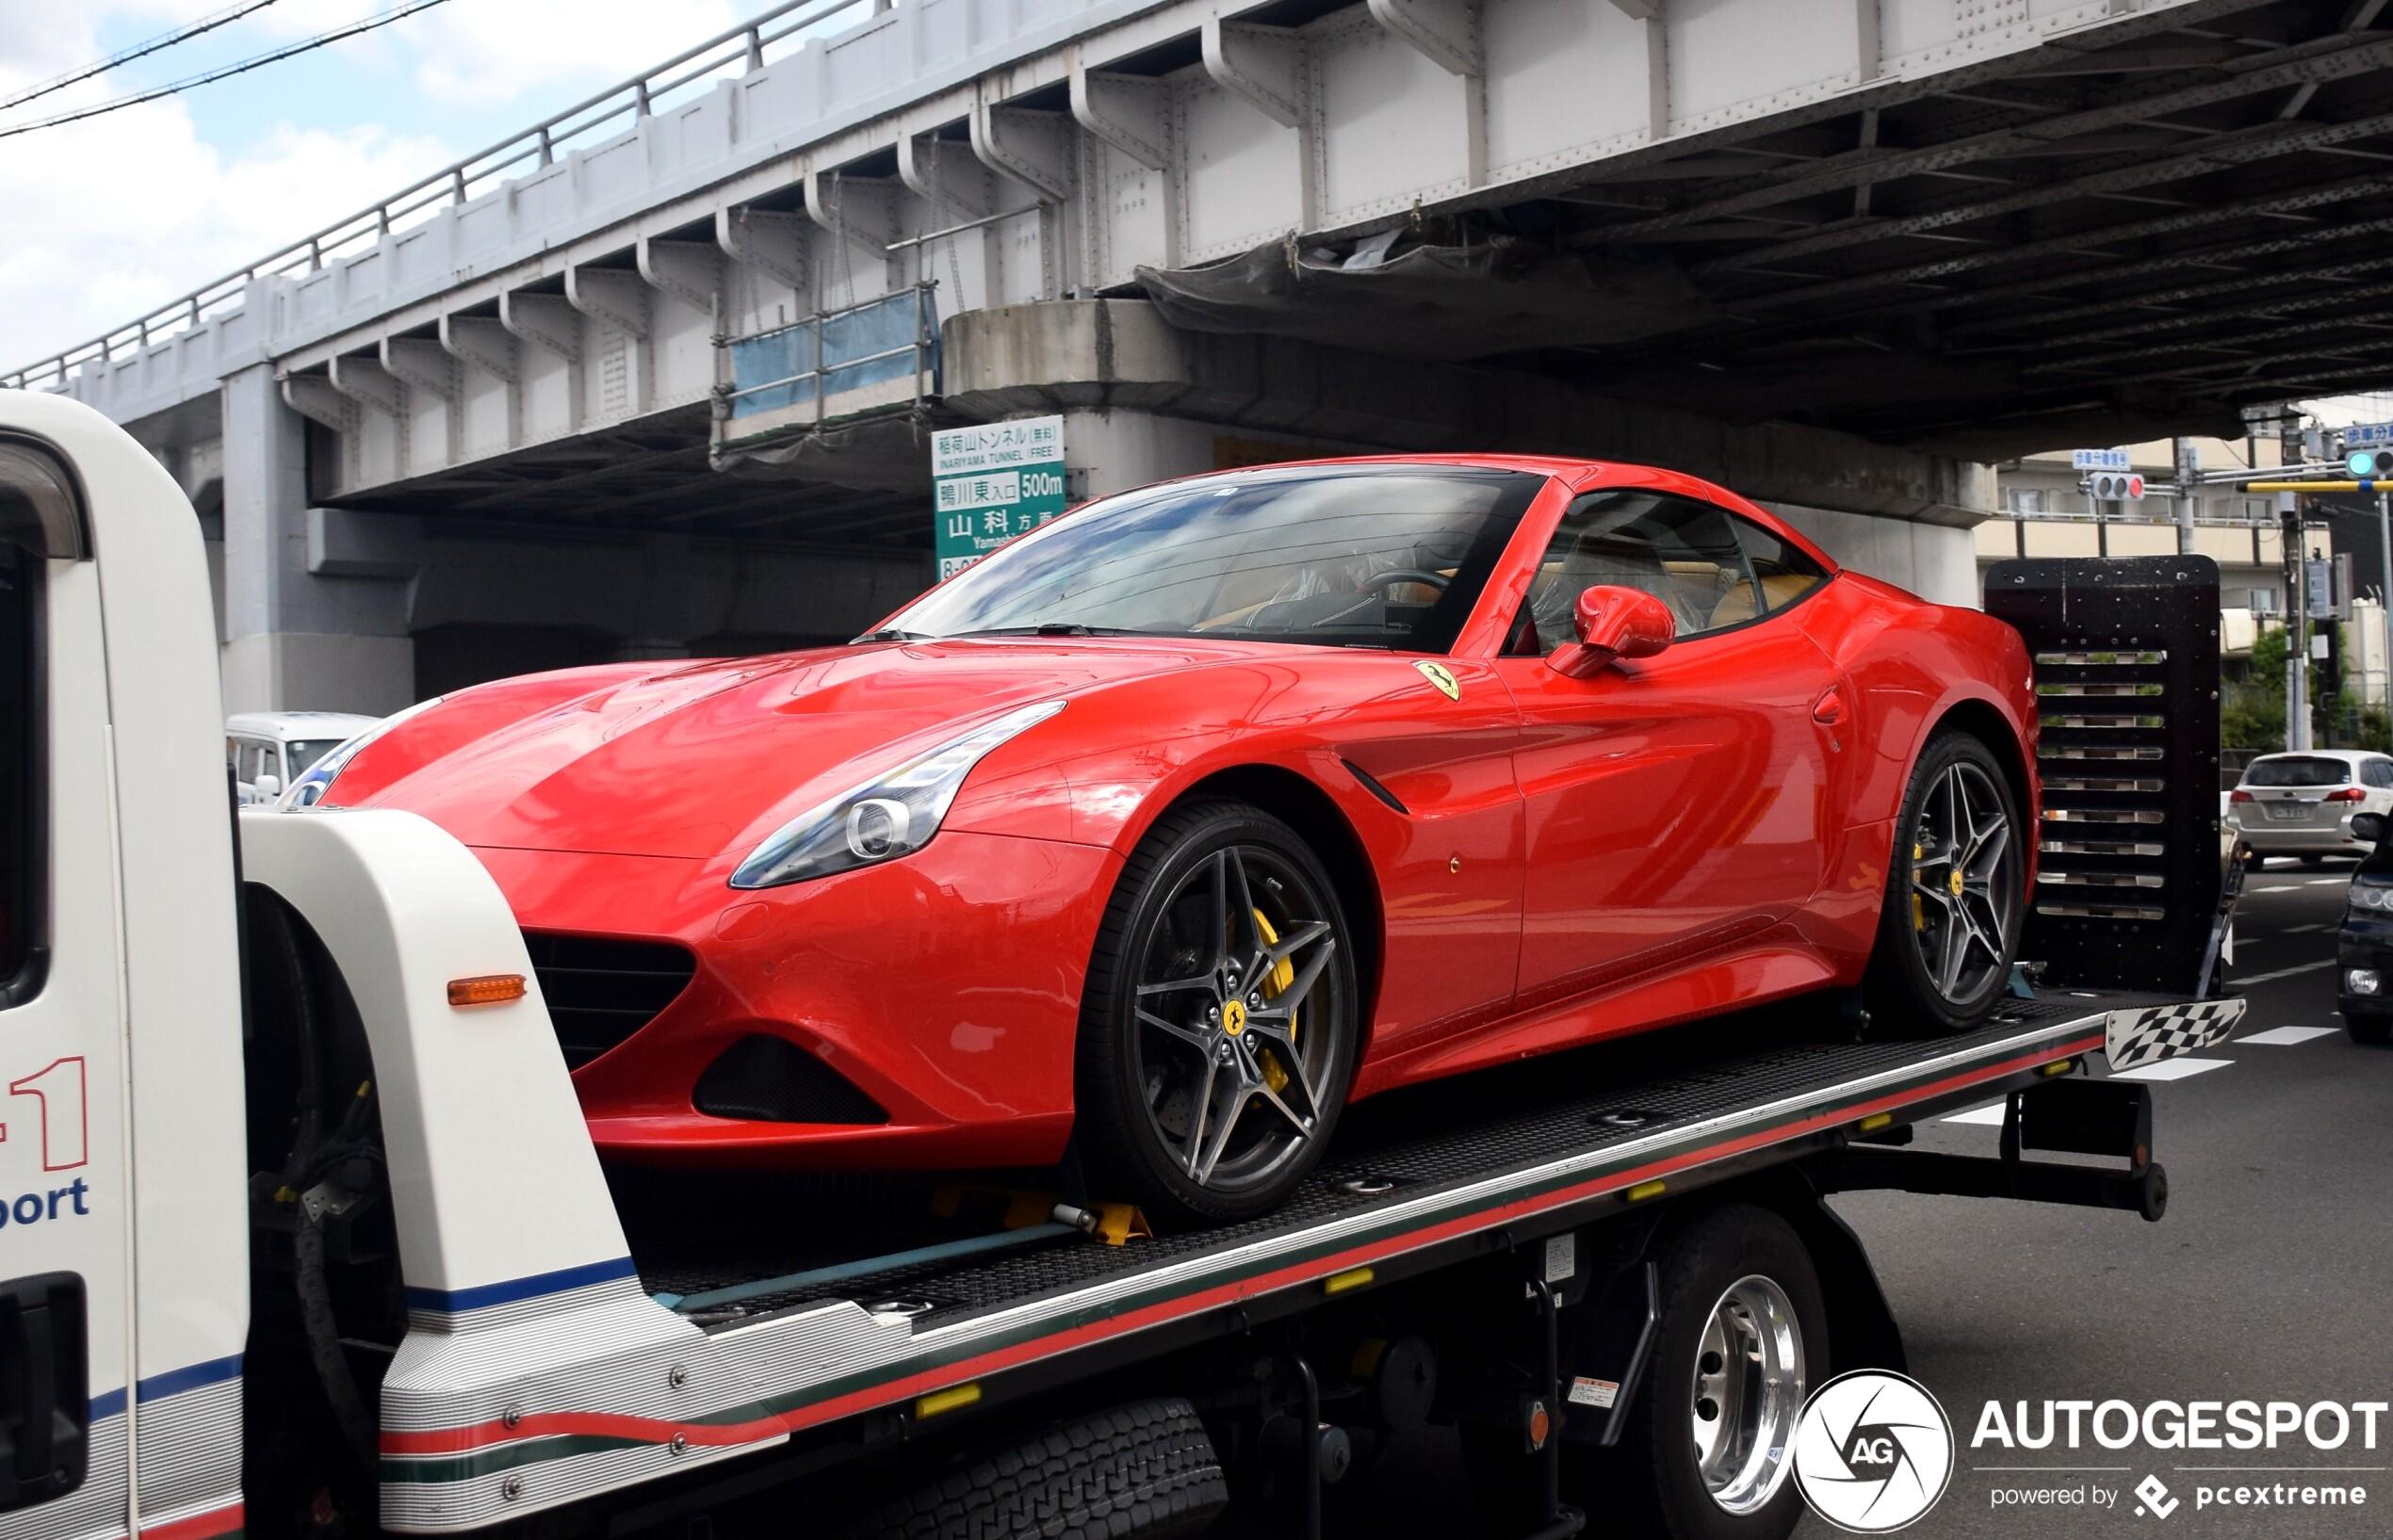 Ferrari California T - 10 January 2020 - Autogespot